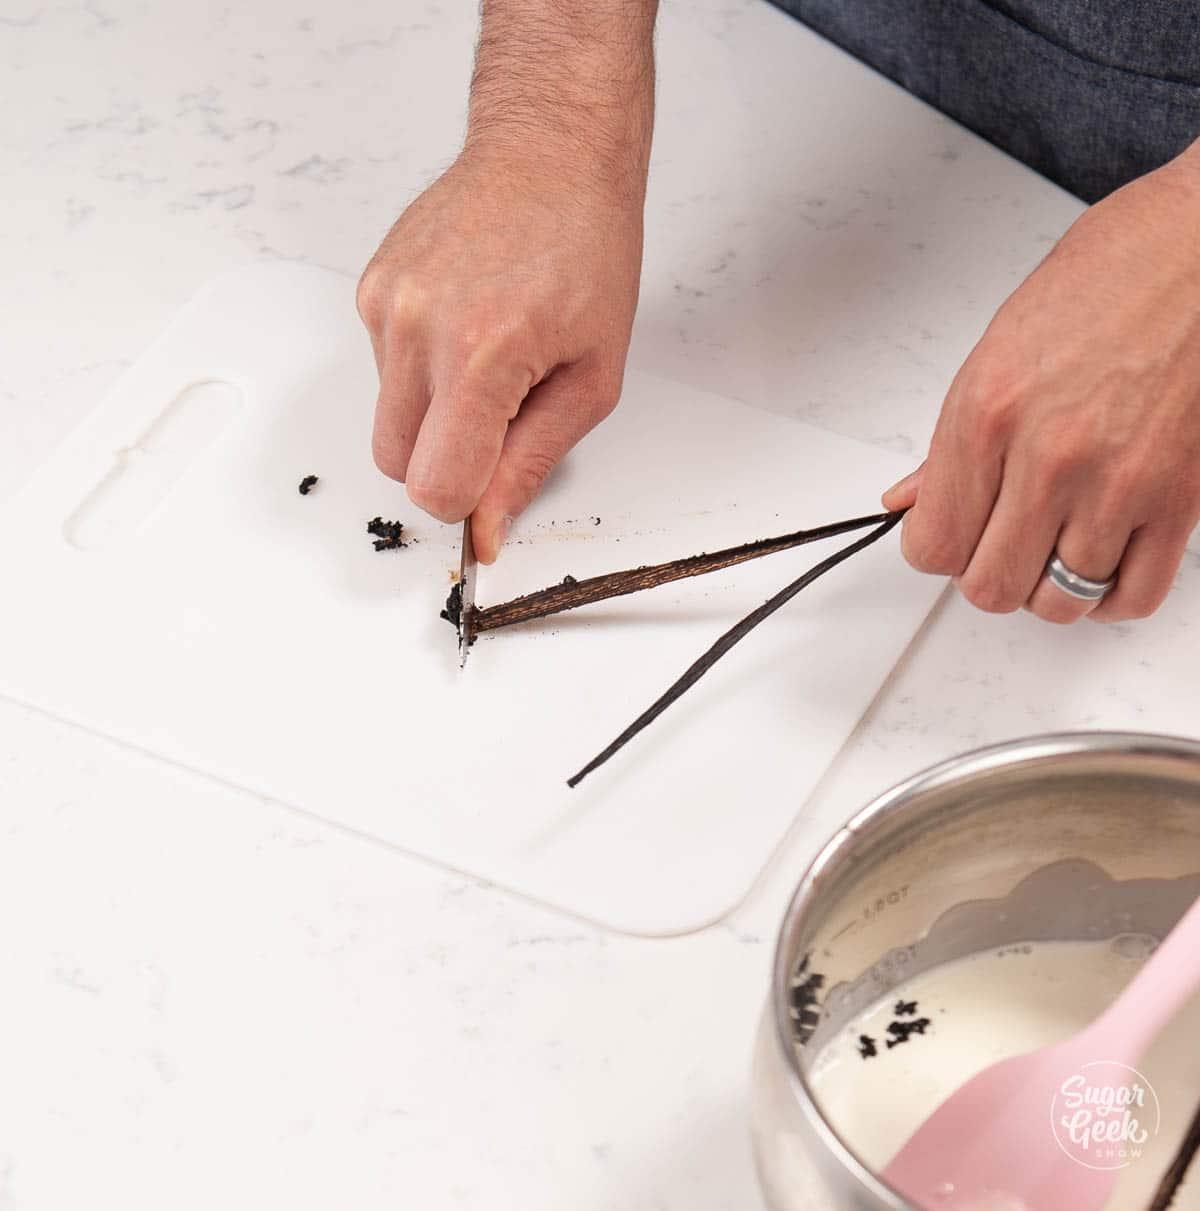 scraping vanilla seeds from a vanilla bean pod